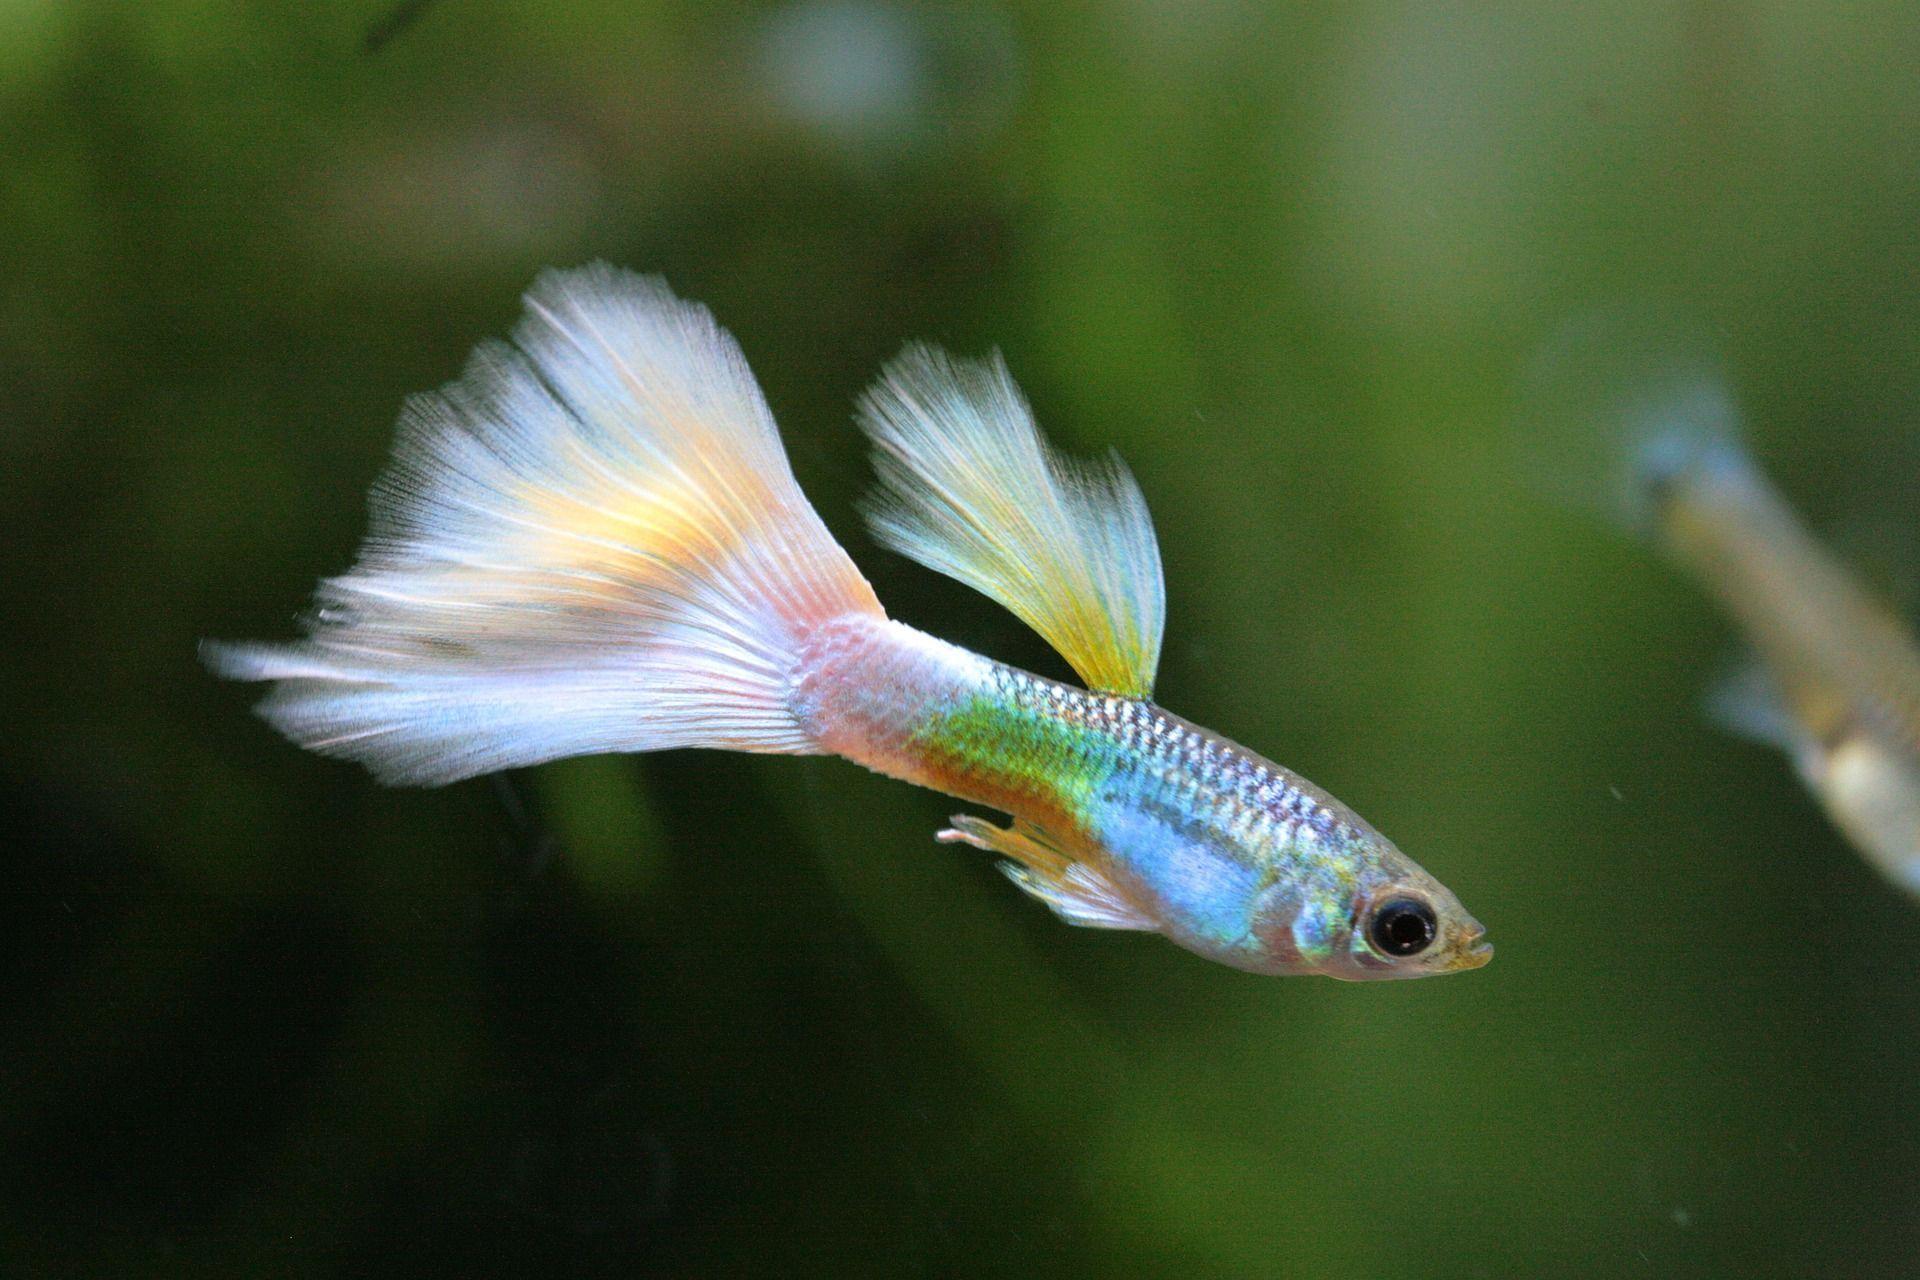 Best Freshwater Fish For Aquarium 5th Is The Coolest You Ve Ever Seen Aquariumfreshwaterfishanimals Fresh Water Fish Tank Guppy Fish Community Fish Tank